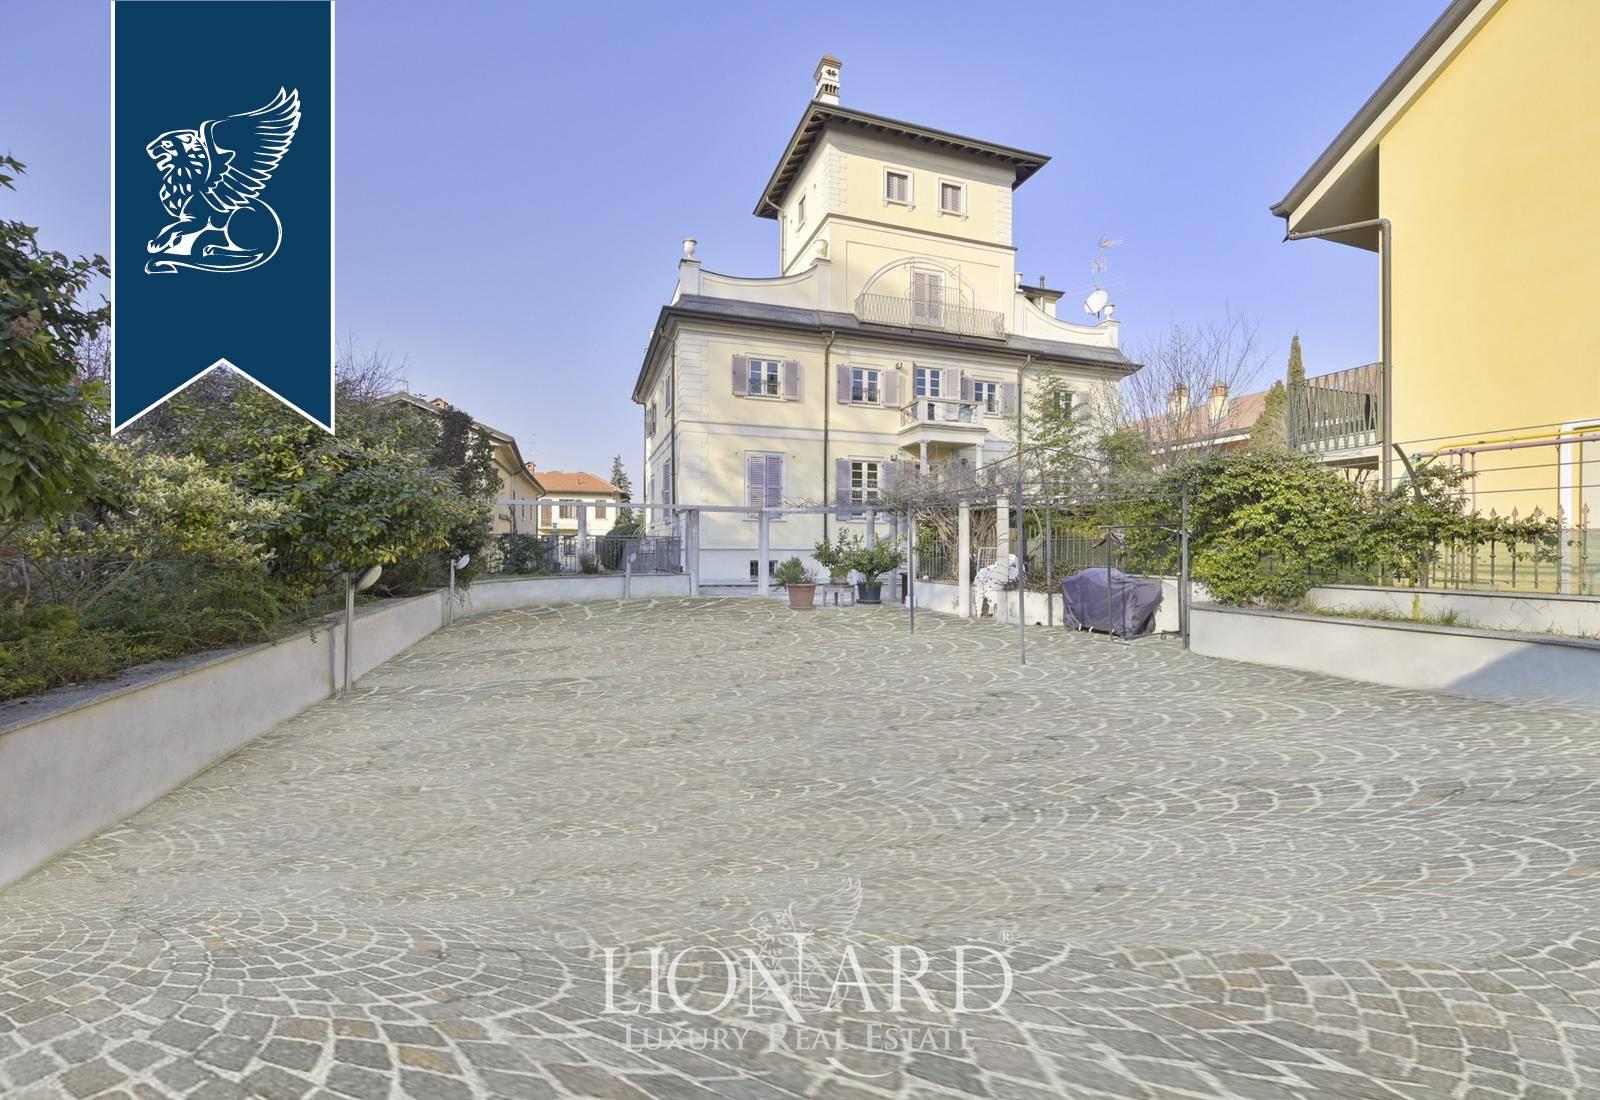 Villa in Vendita a Buscate: 0 locali, 890 mq - Foto 3